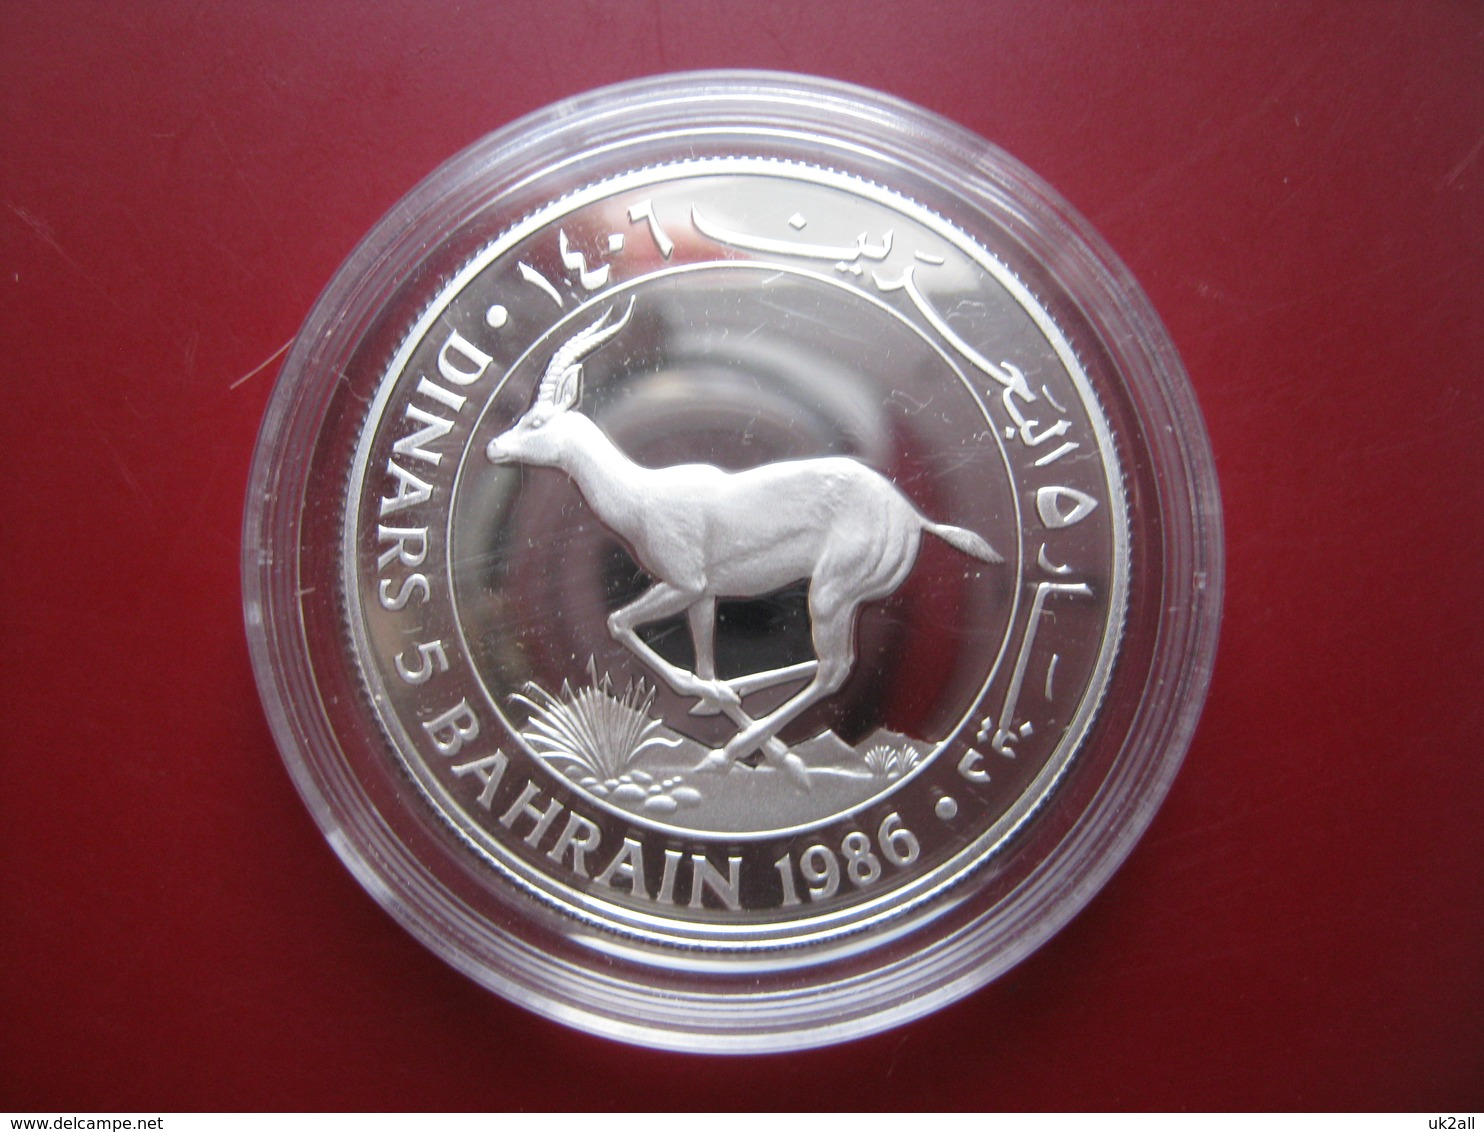 Bahrain 1986 5 Dinars Silver Proof Coin WWF With COA Card - Rhim Gazelle - Bahrein